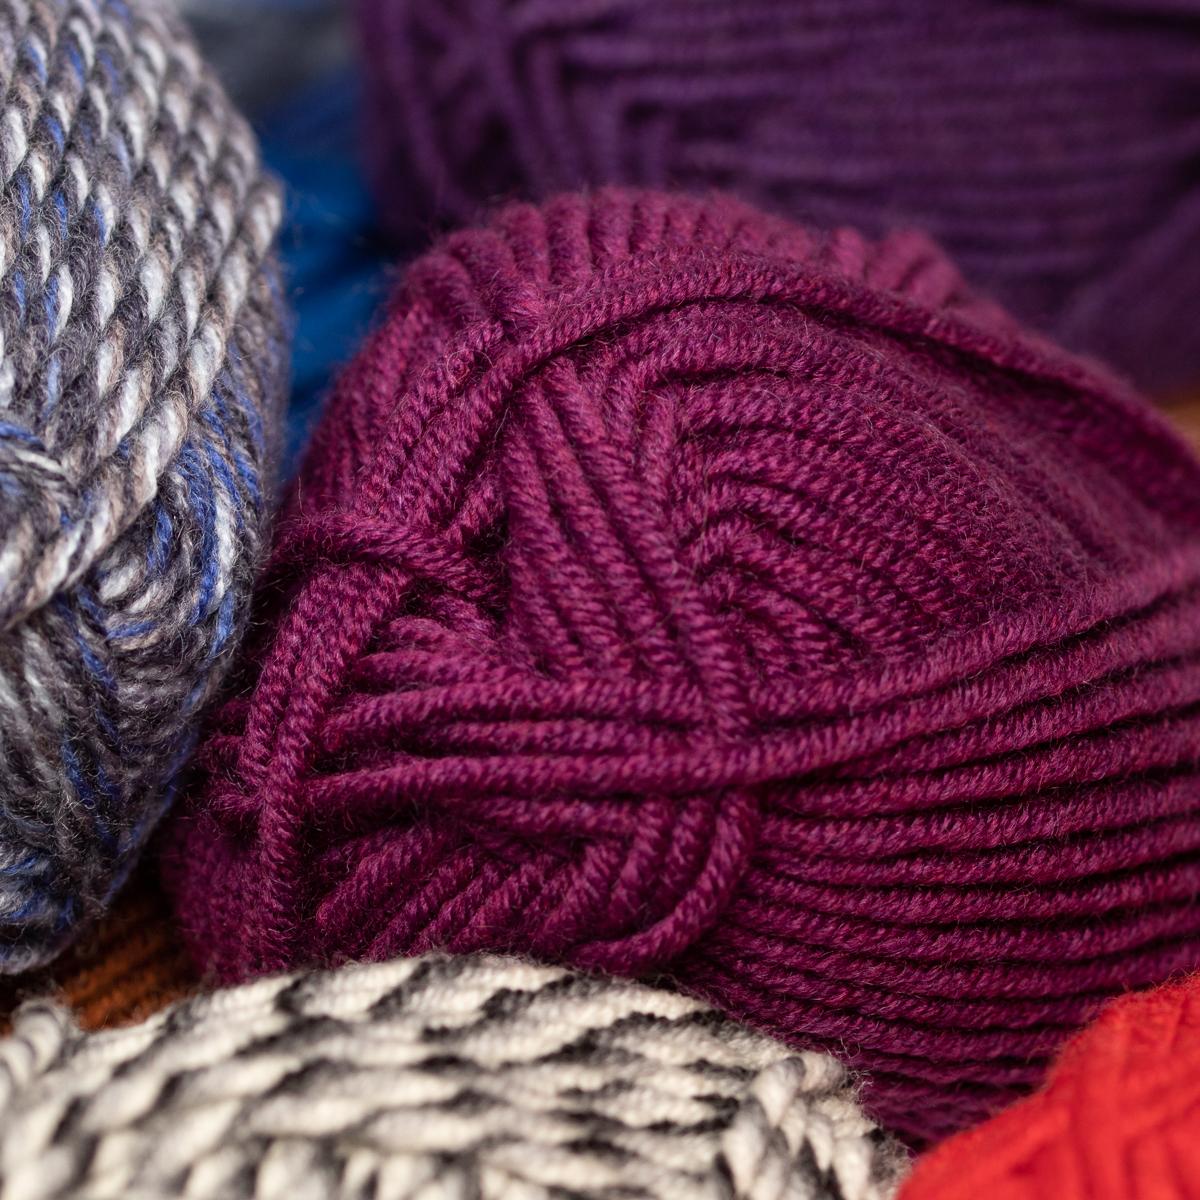 3pk-Lion-Brand-Woolspun-Acrylic-amp-Wool-Yarn-Bulky-5-Knit-Crocheting-Skeins-Soft thumbnail 70